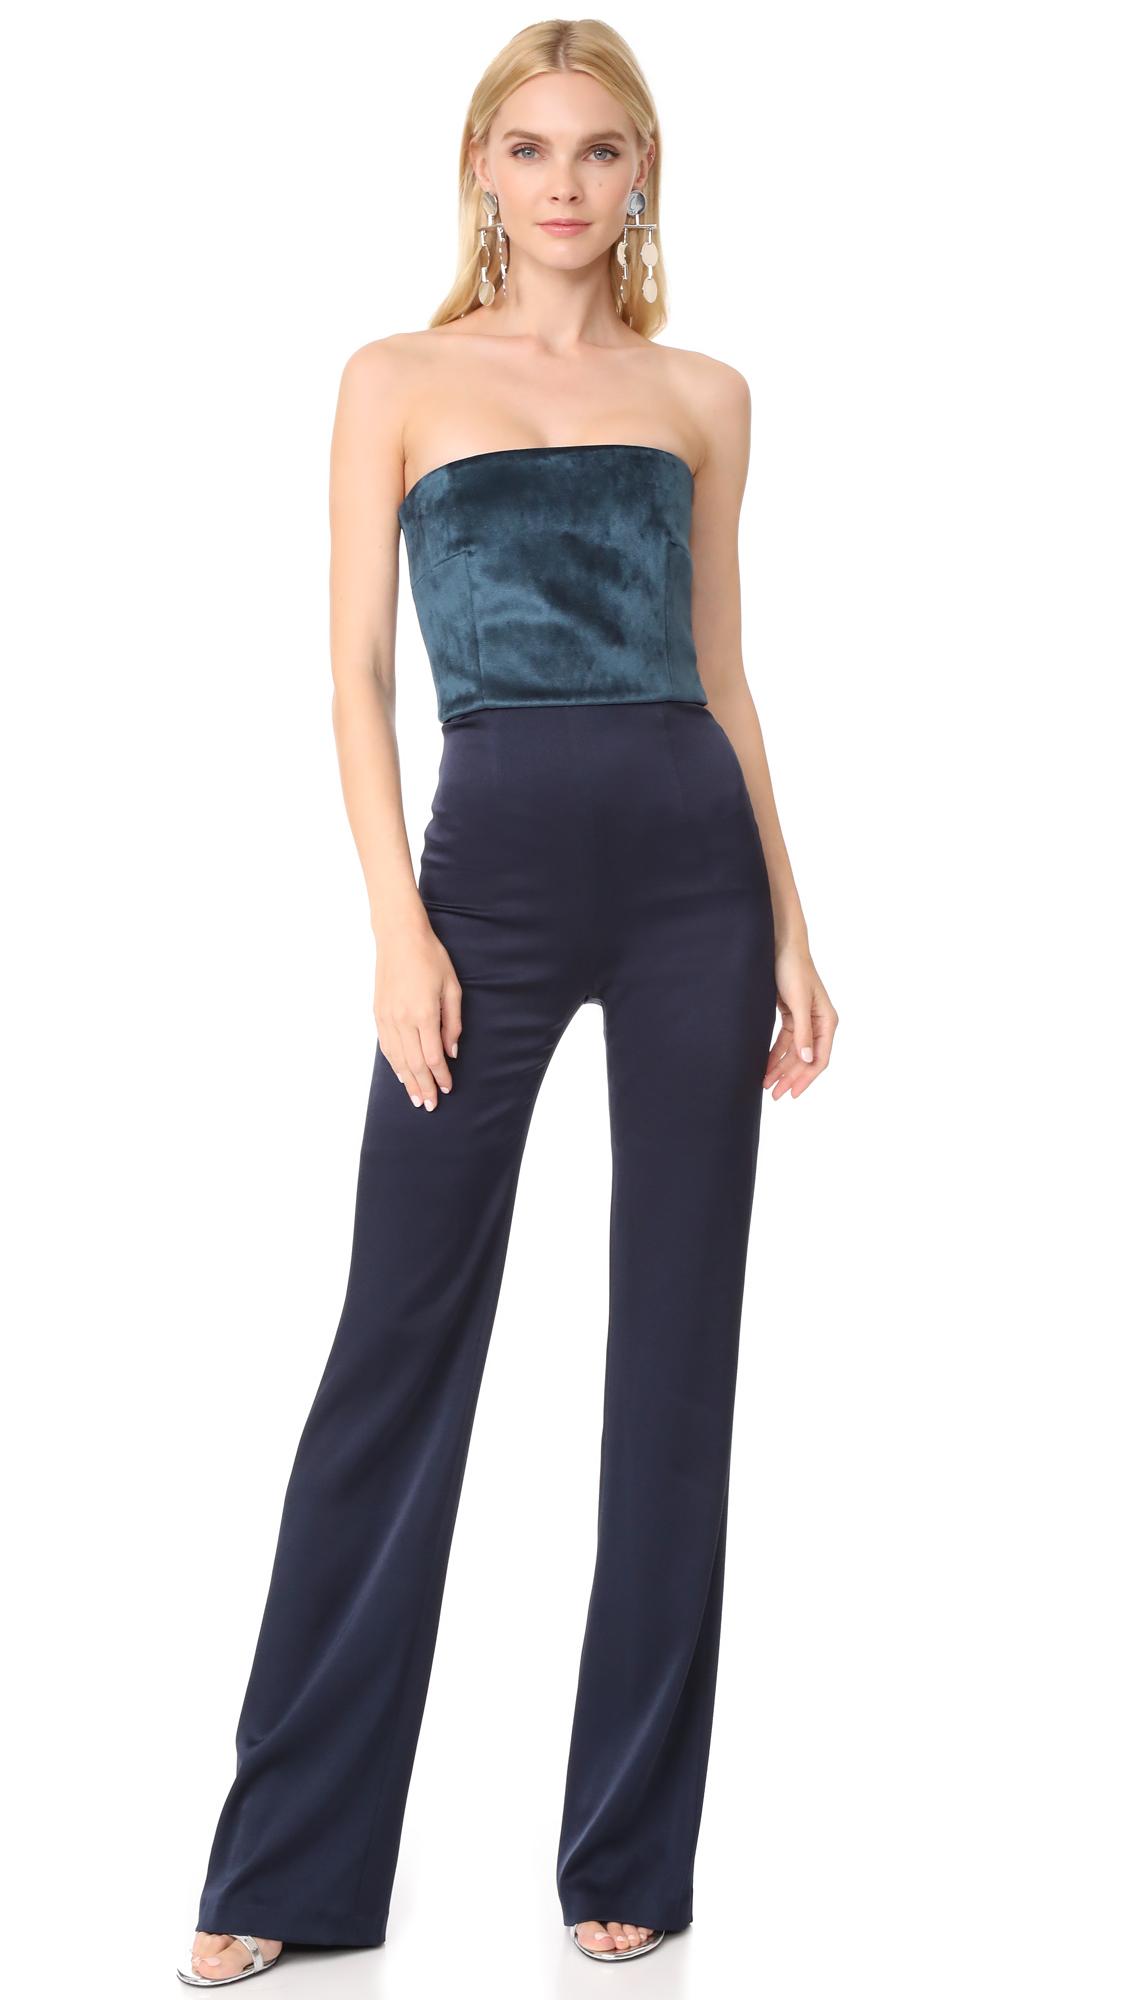 Galvan London Strapless Velvet Jumpsuit - Petrol/Midnight